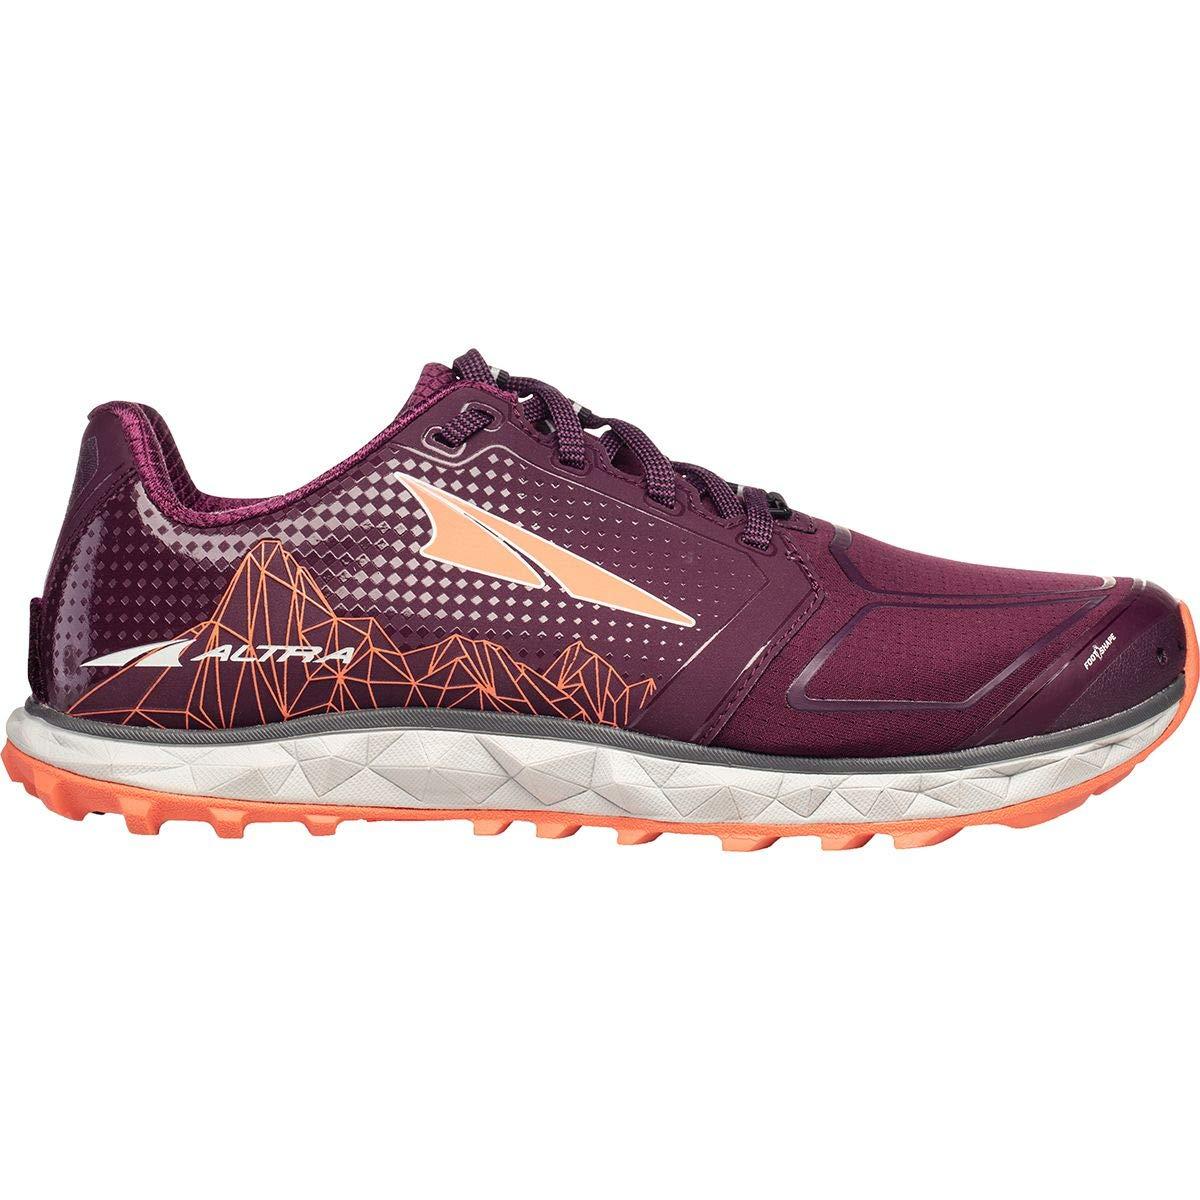 【WEB限定】 [オルトラ] レディース Superior ランニング Superior 7.5 [並行輸入品] 4.0 Trail Running Shoe [並行輸入品] B07P1QLCQY 7.5, ストーブ市場:fa492b94 --- palmistry.woxpedia.com